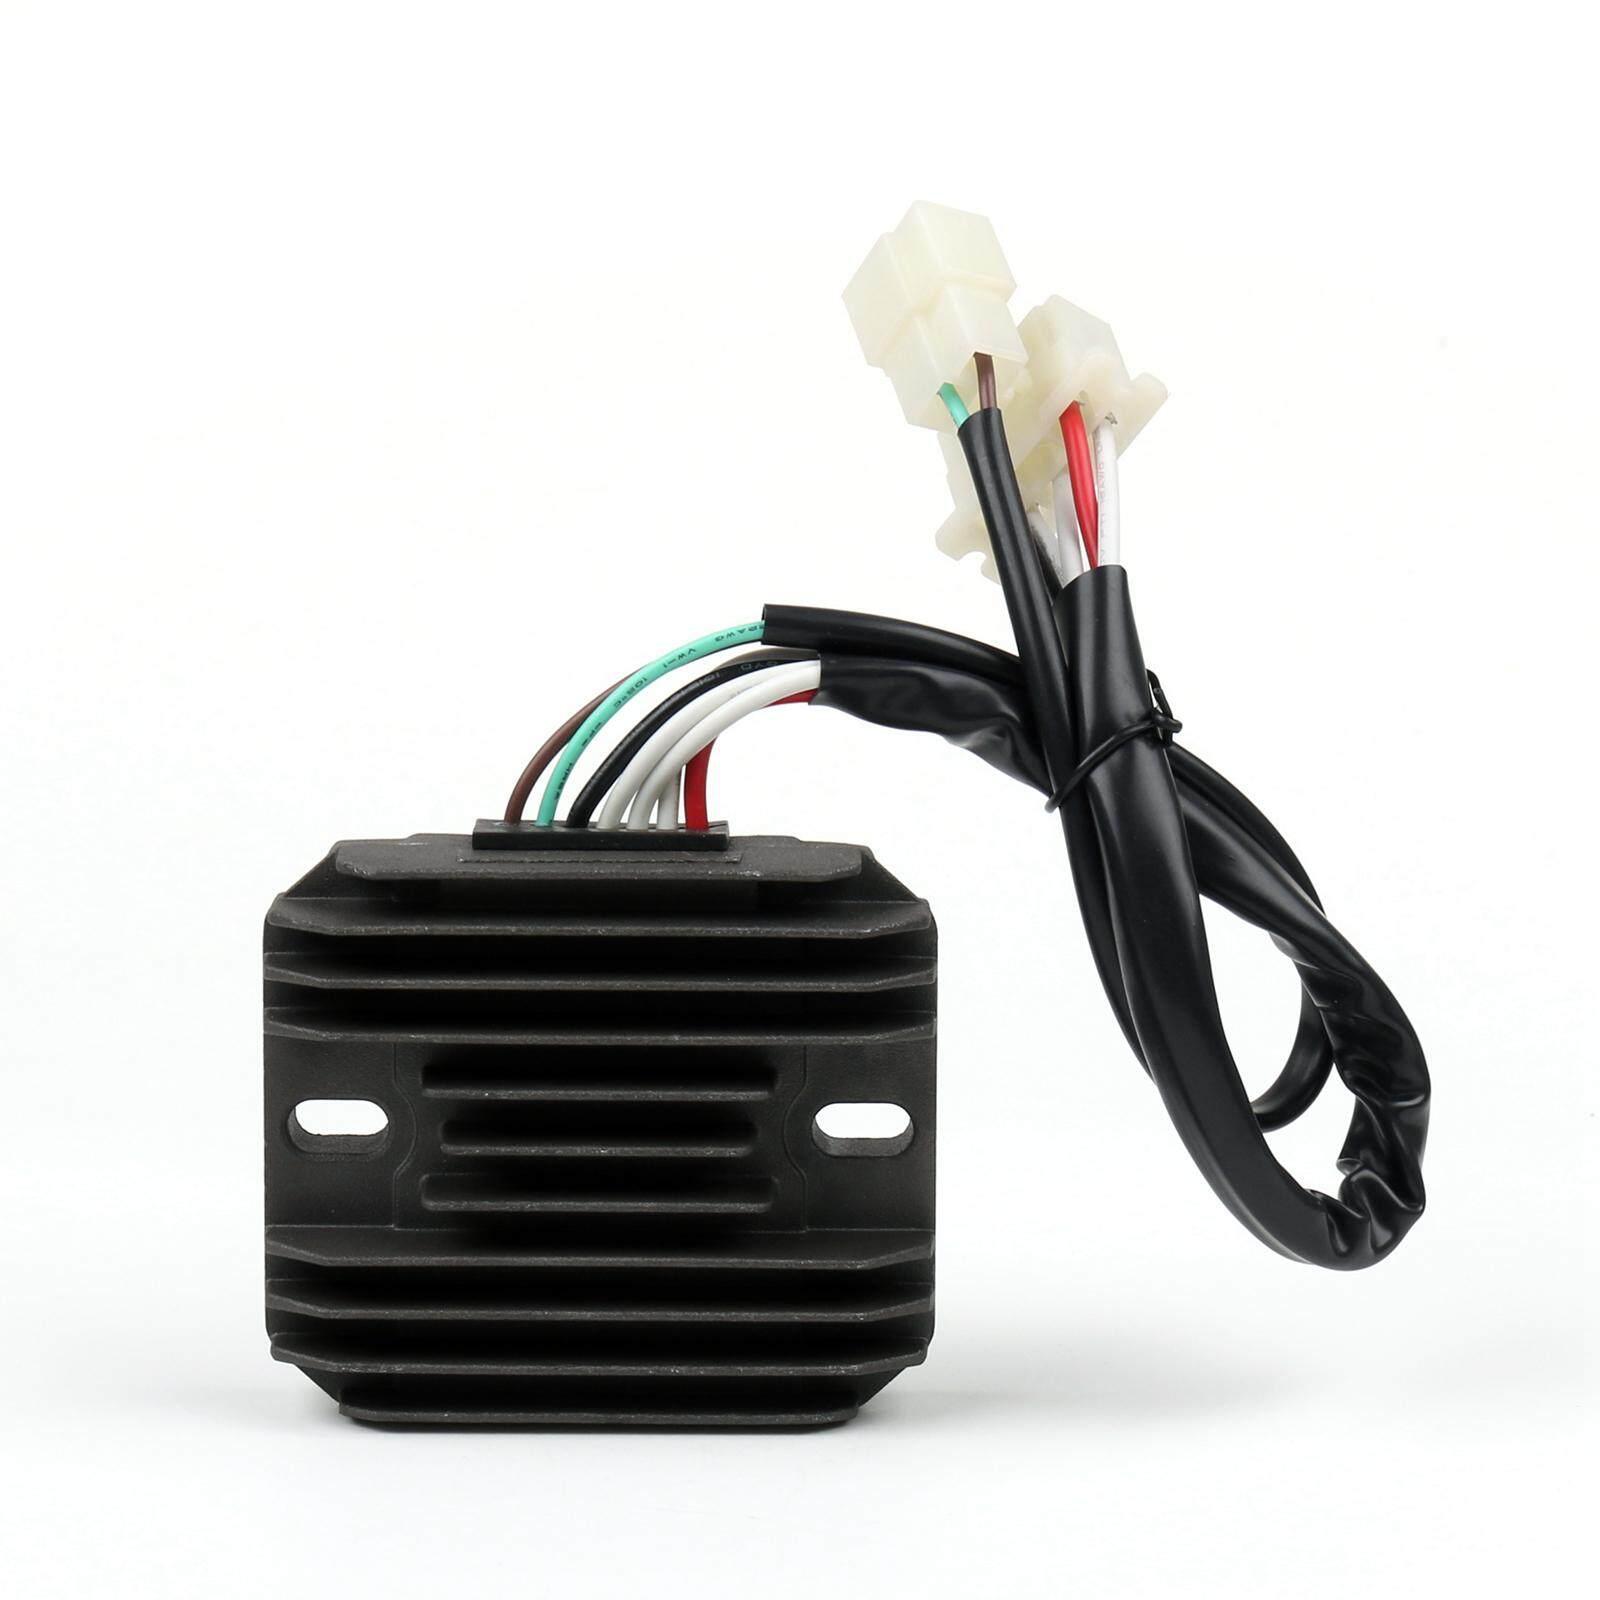 Voltage Regulators For Sale Car Engine Online Brands Denso Mini Alternator Wiring Chevy Areyourshop Regulator Rectifier Xs850 826cc Xs1100 1101cc Xs750 747cc